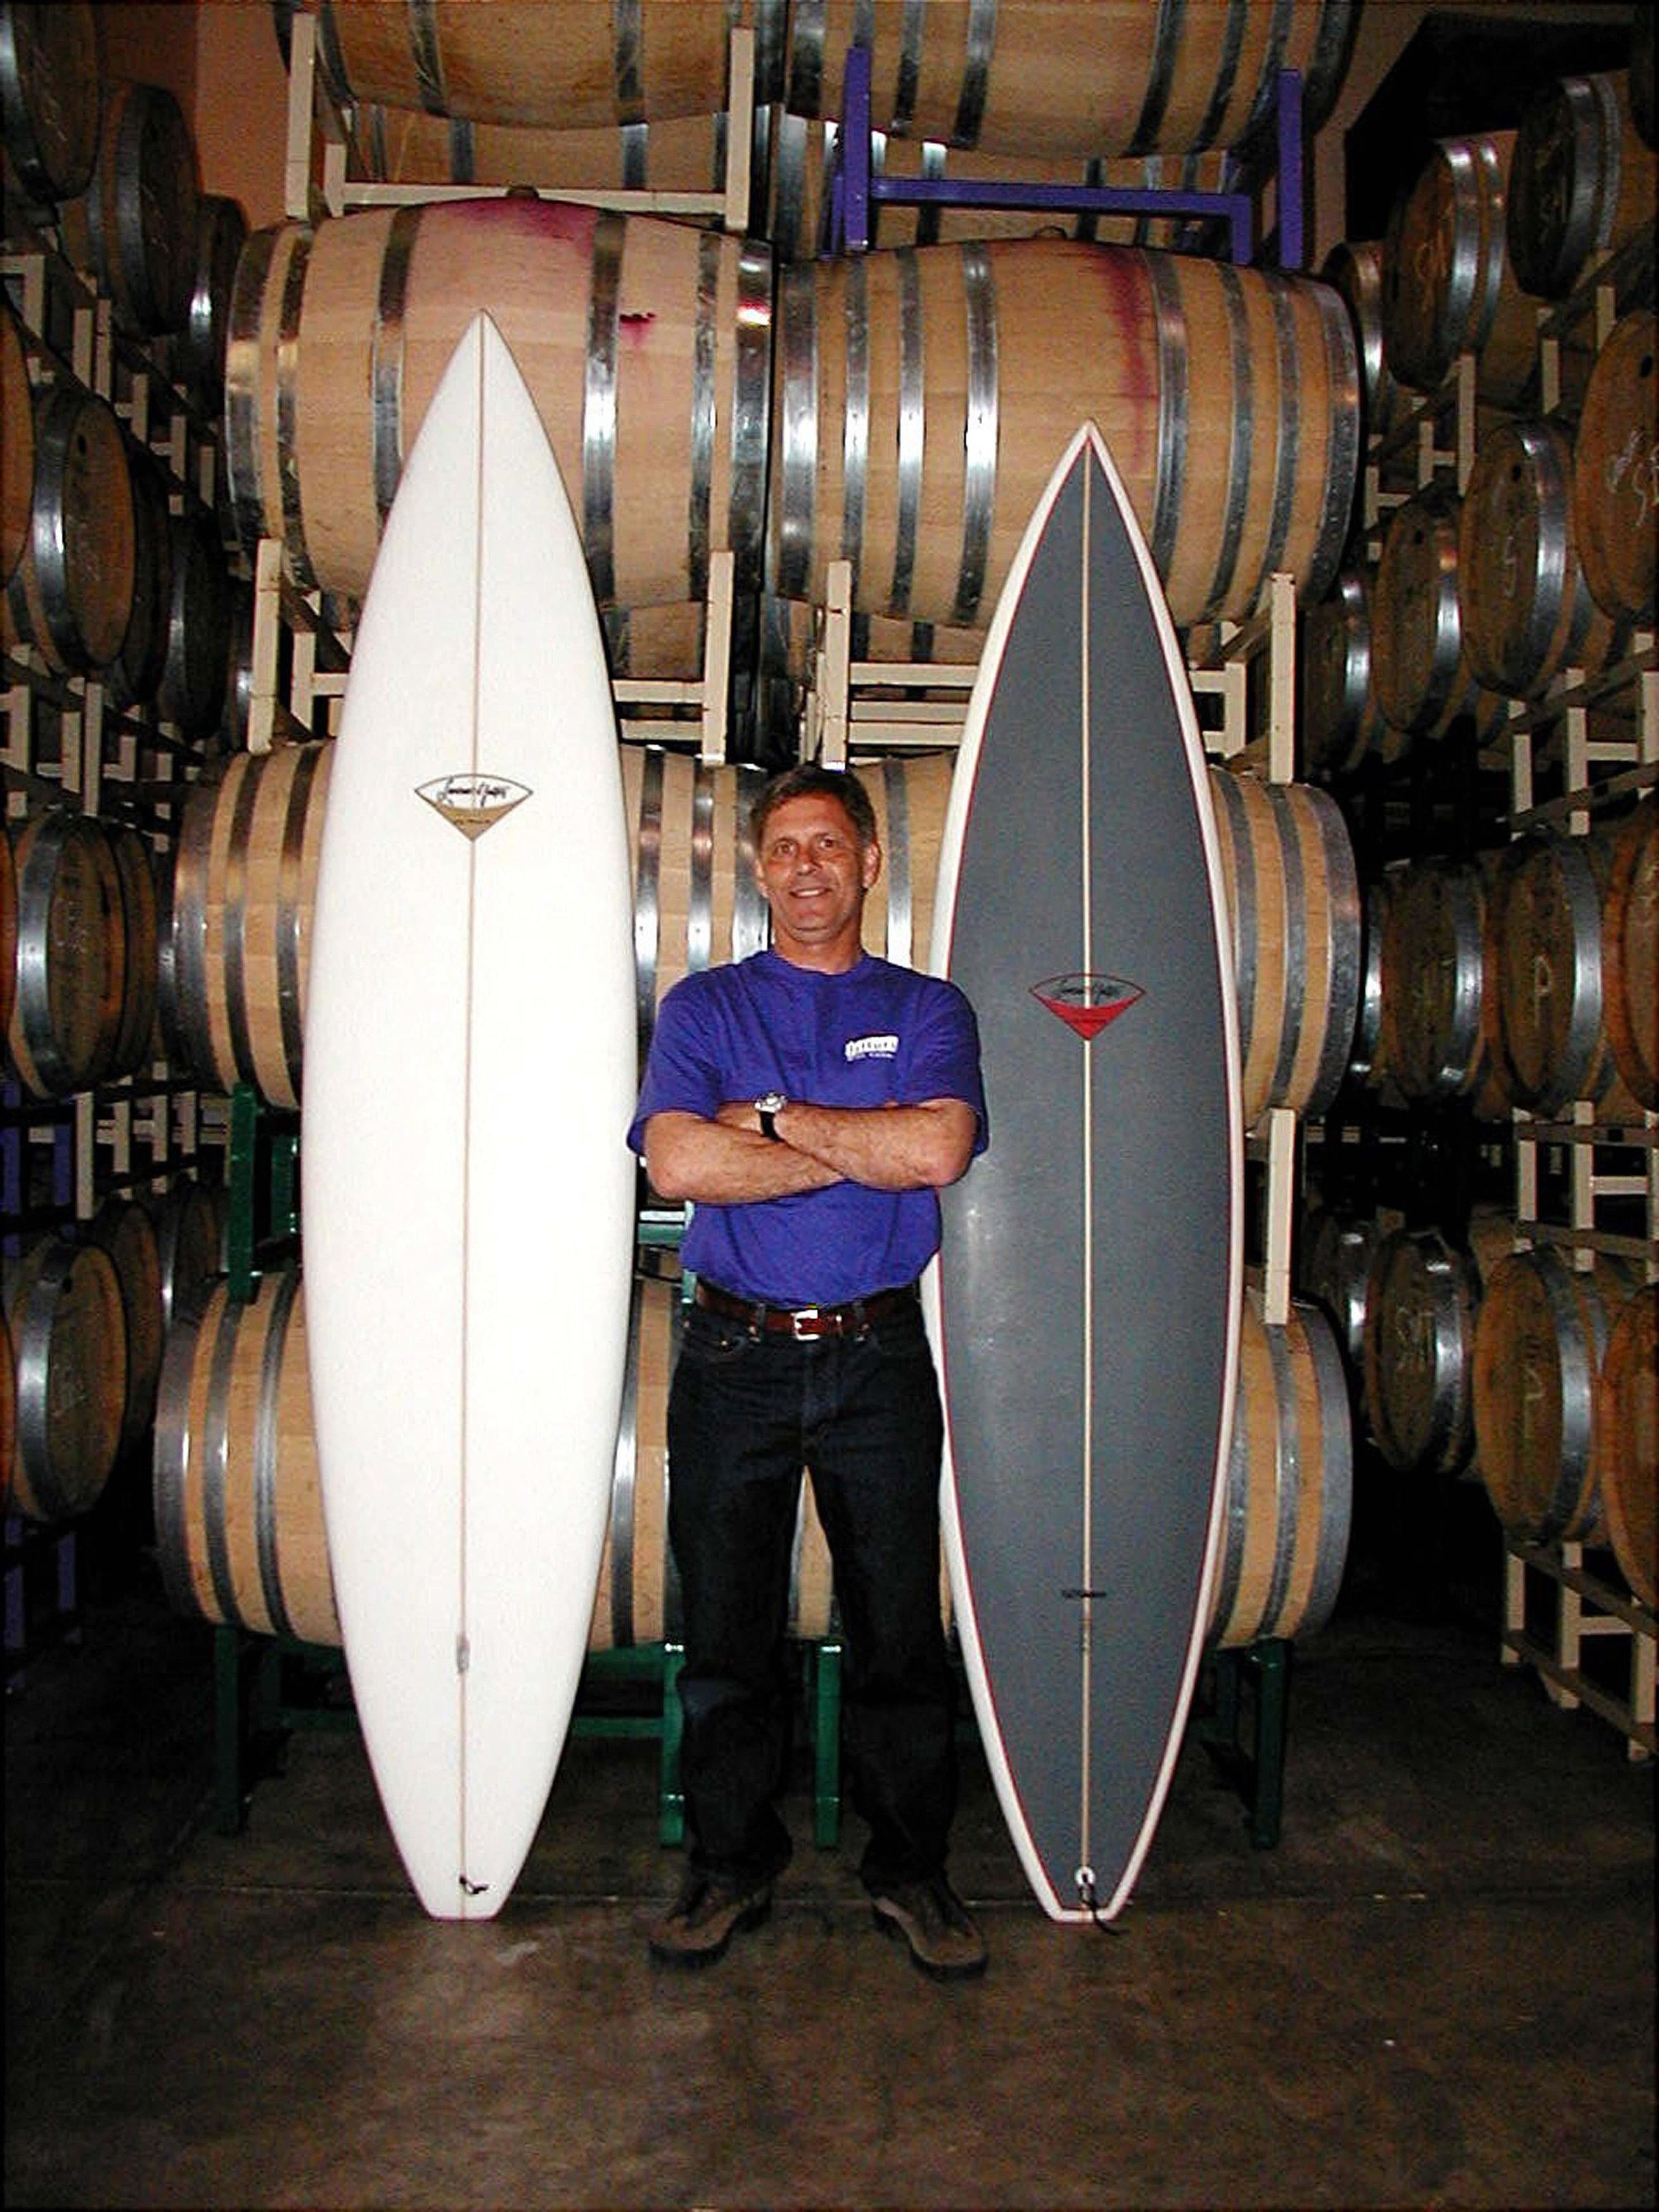 craig-jaffurs-w-new-surfboards-2_jpg.jpg